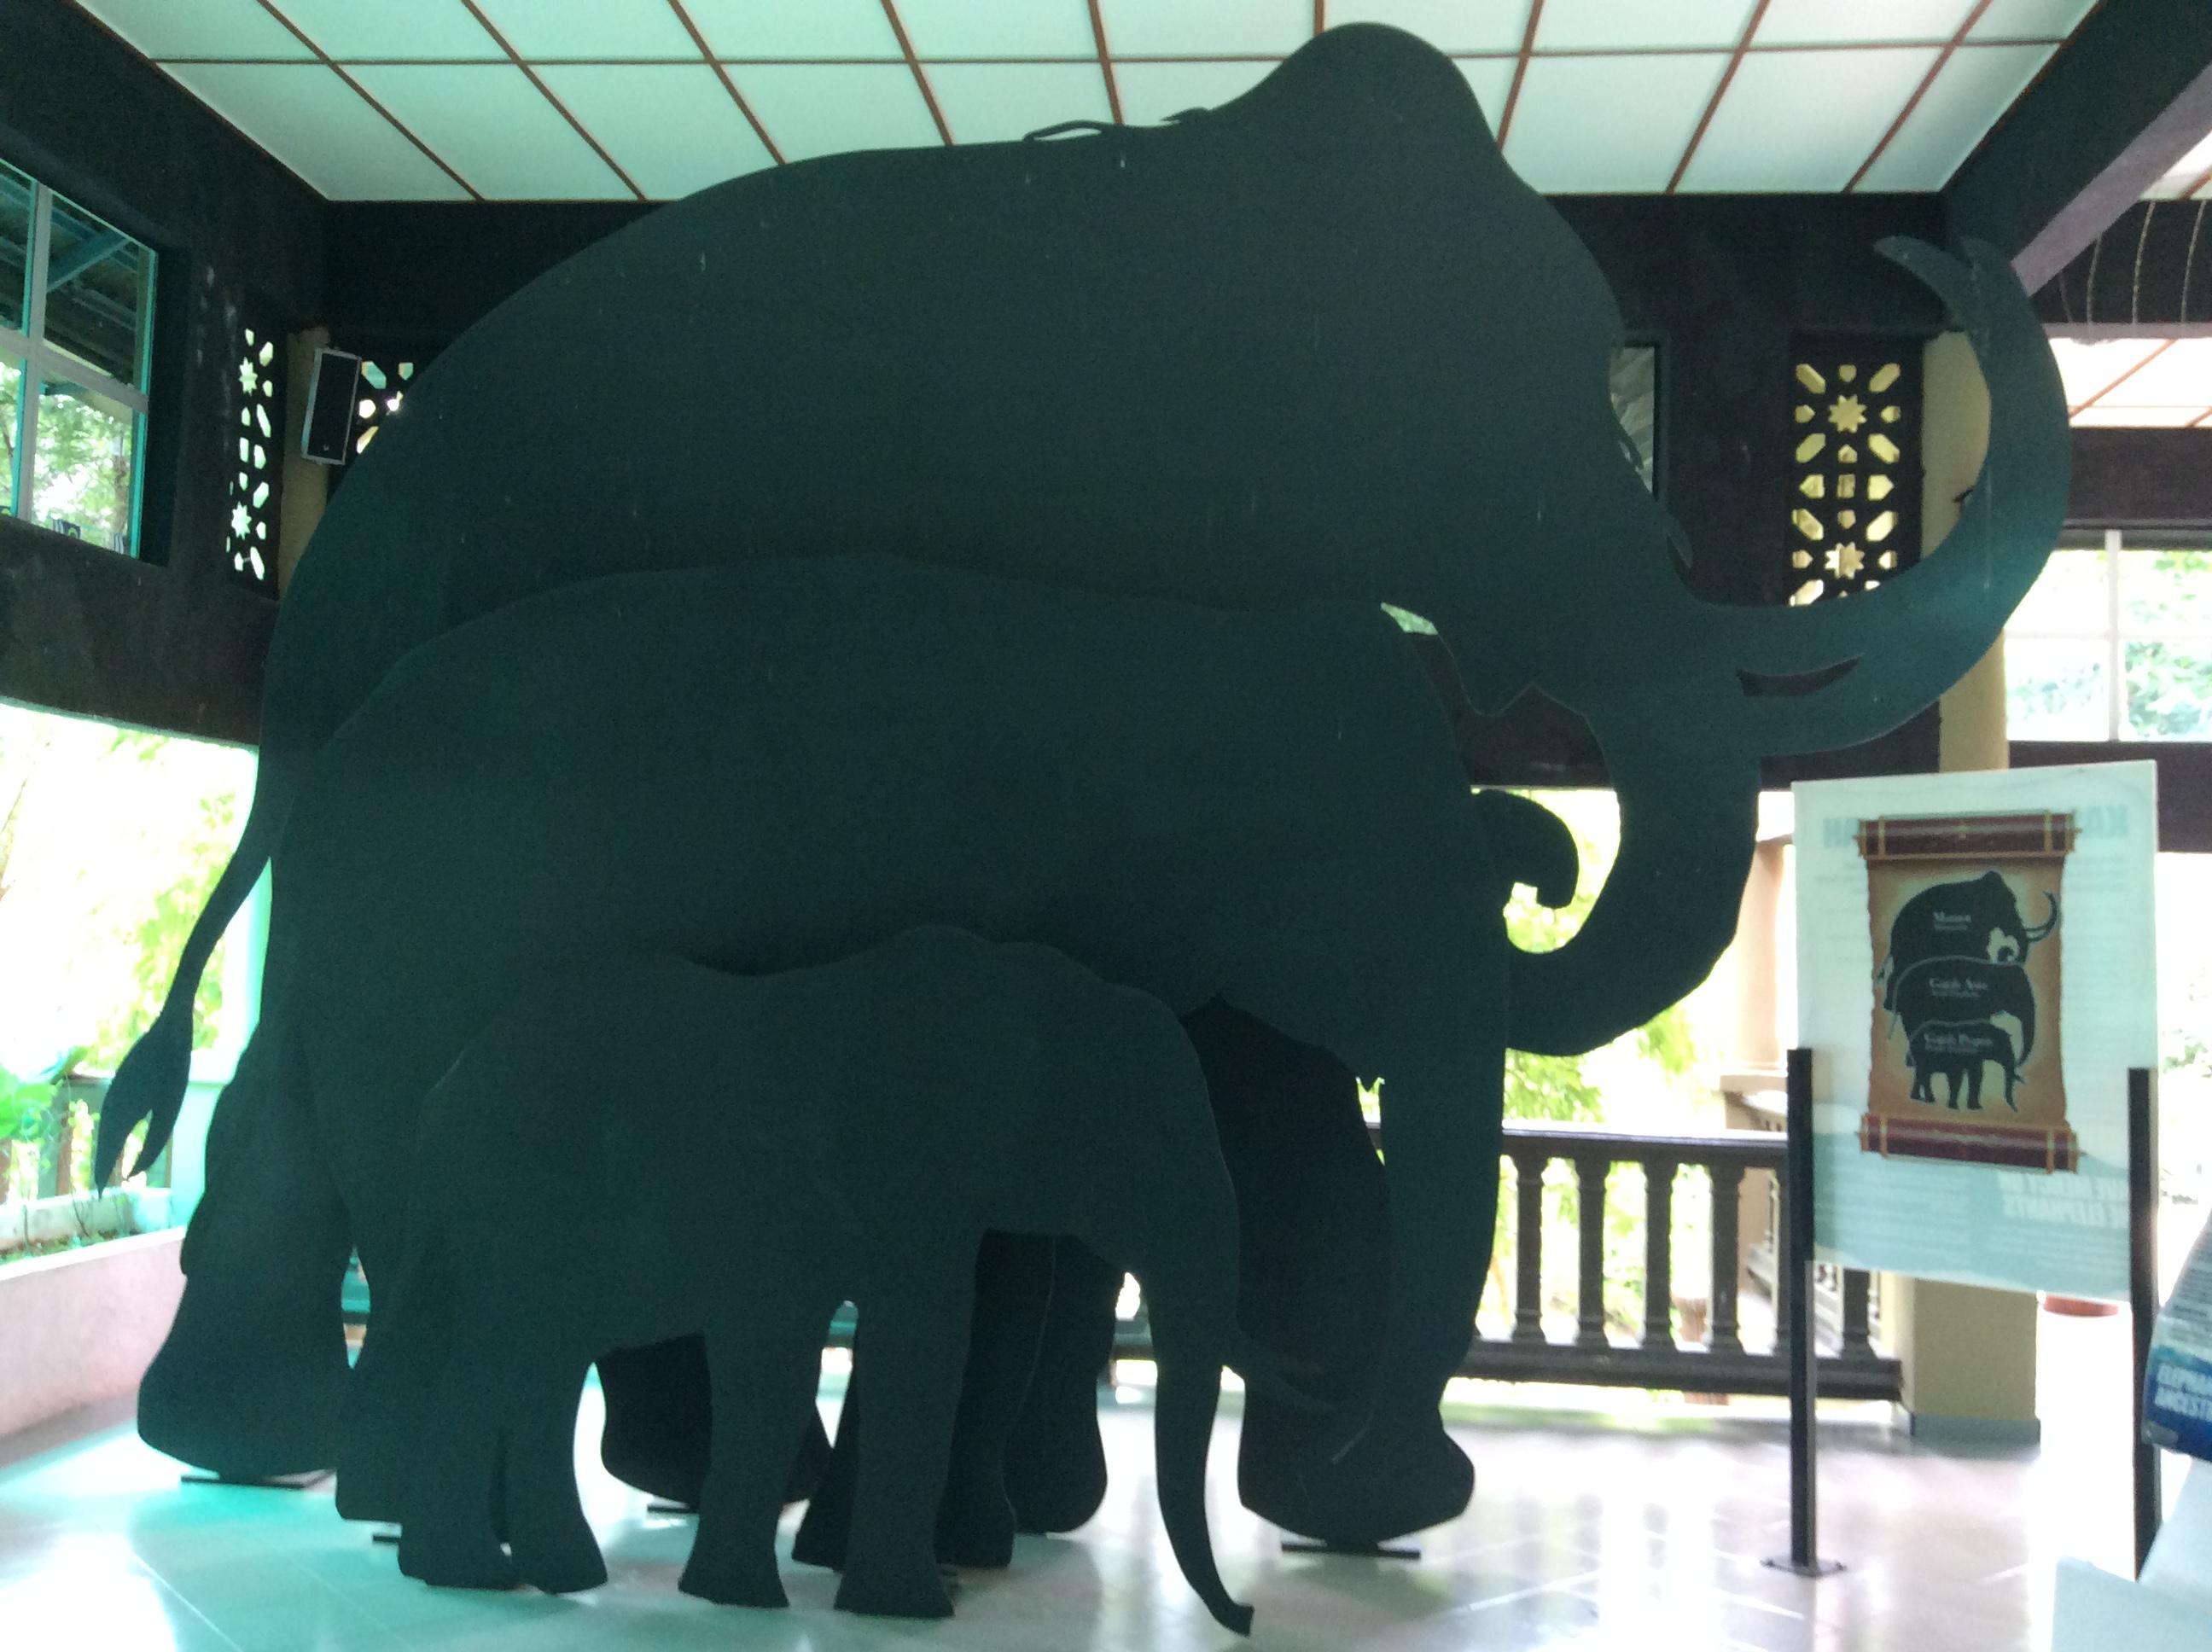 national-elephant-conservation-centre-kuala-gandah-museum-1